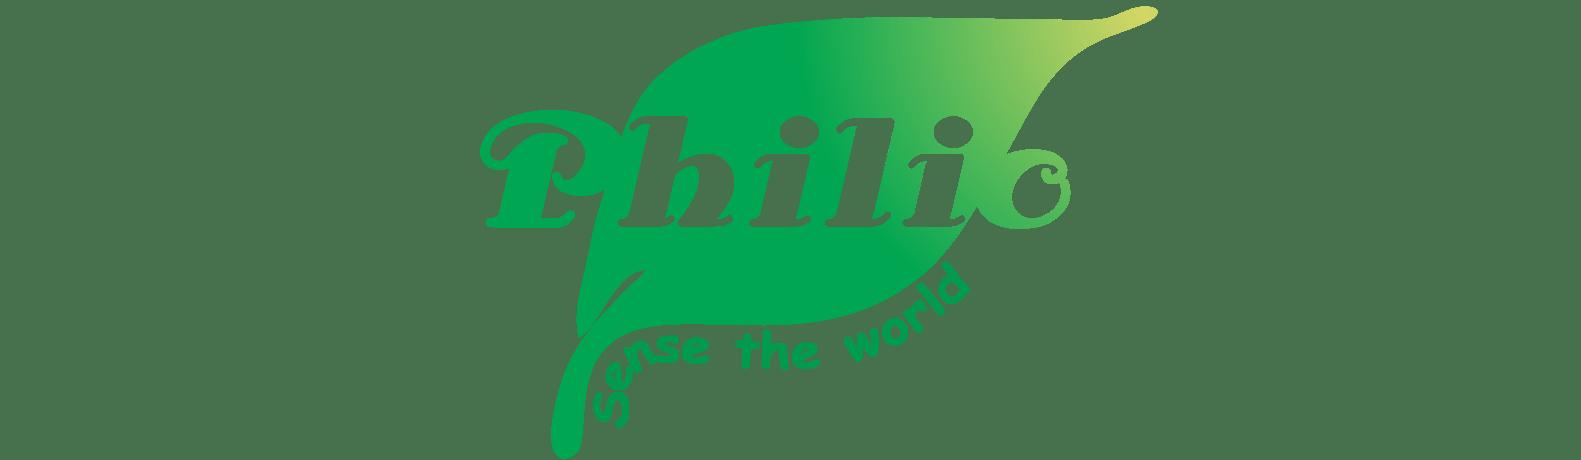 12_Ecosystem_PHILIO_LOGO-2